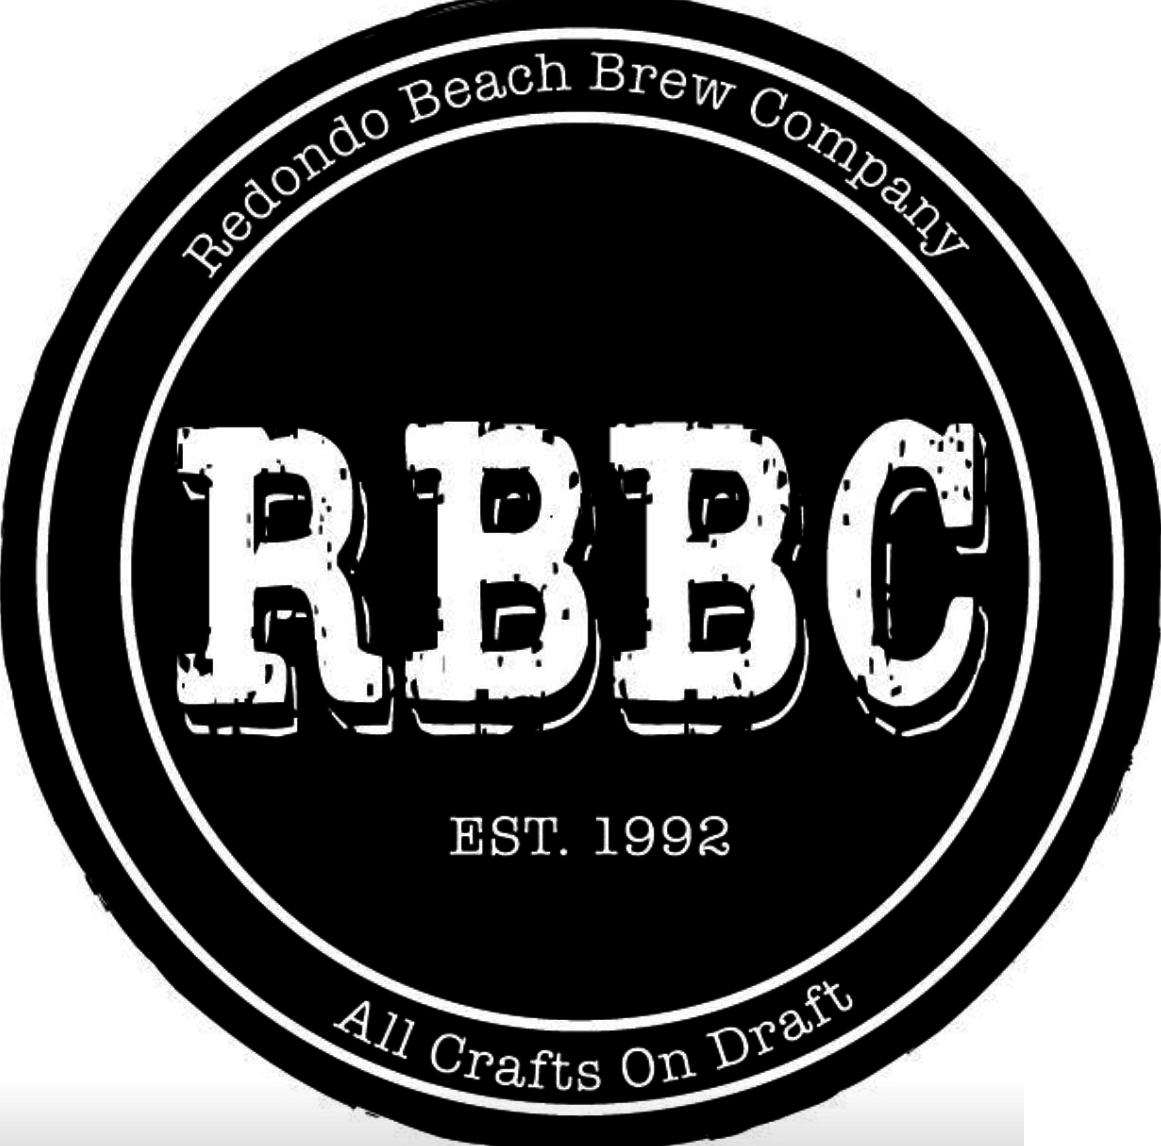 Redondo Beach Brew Co